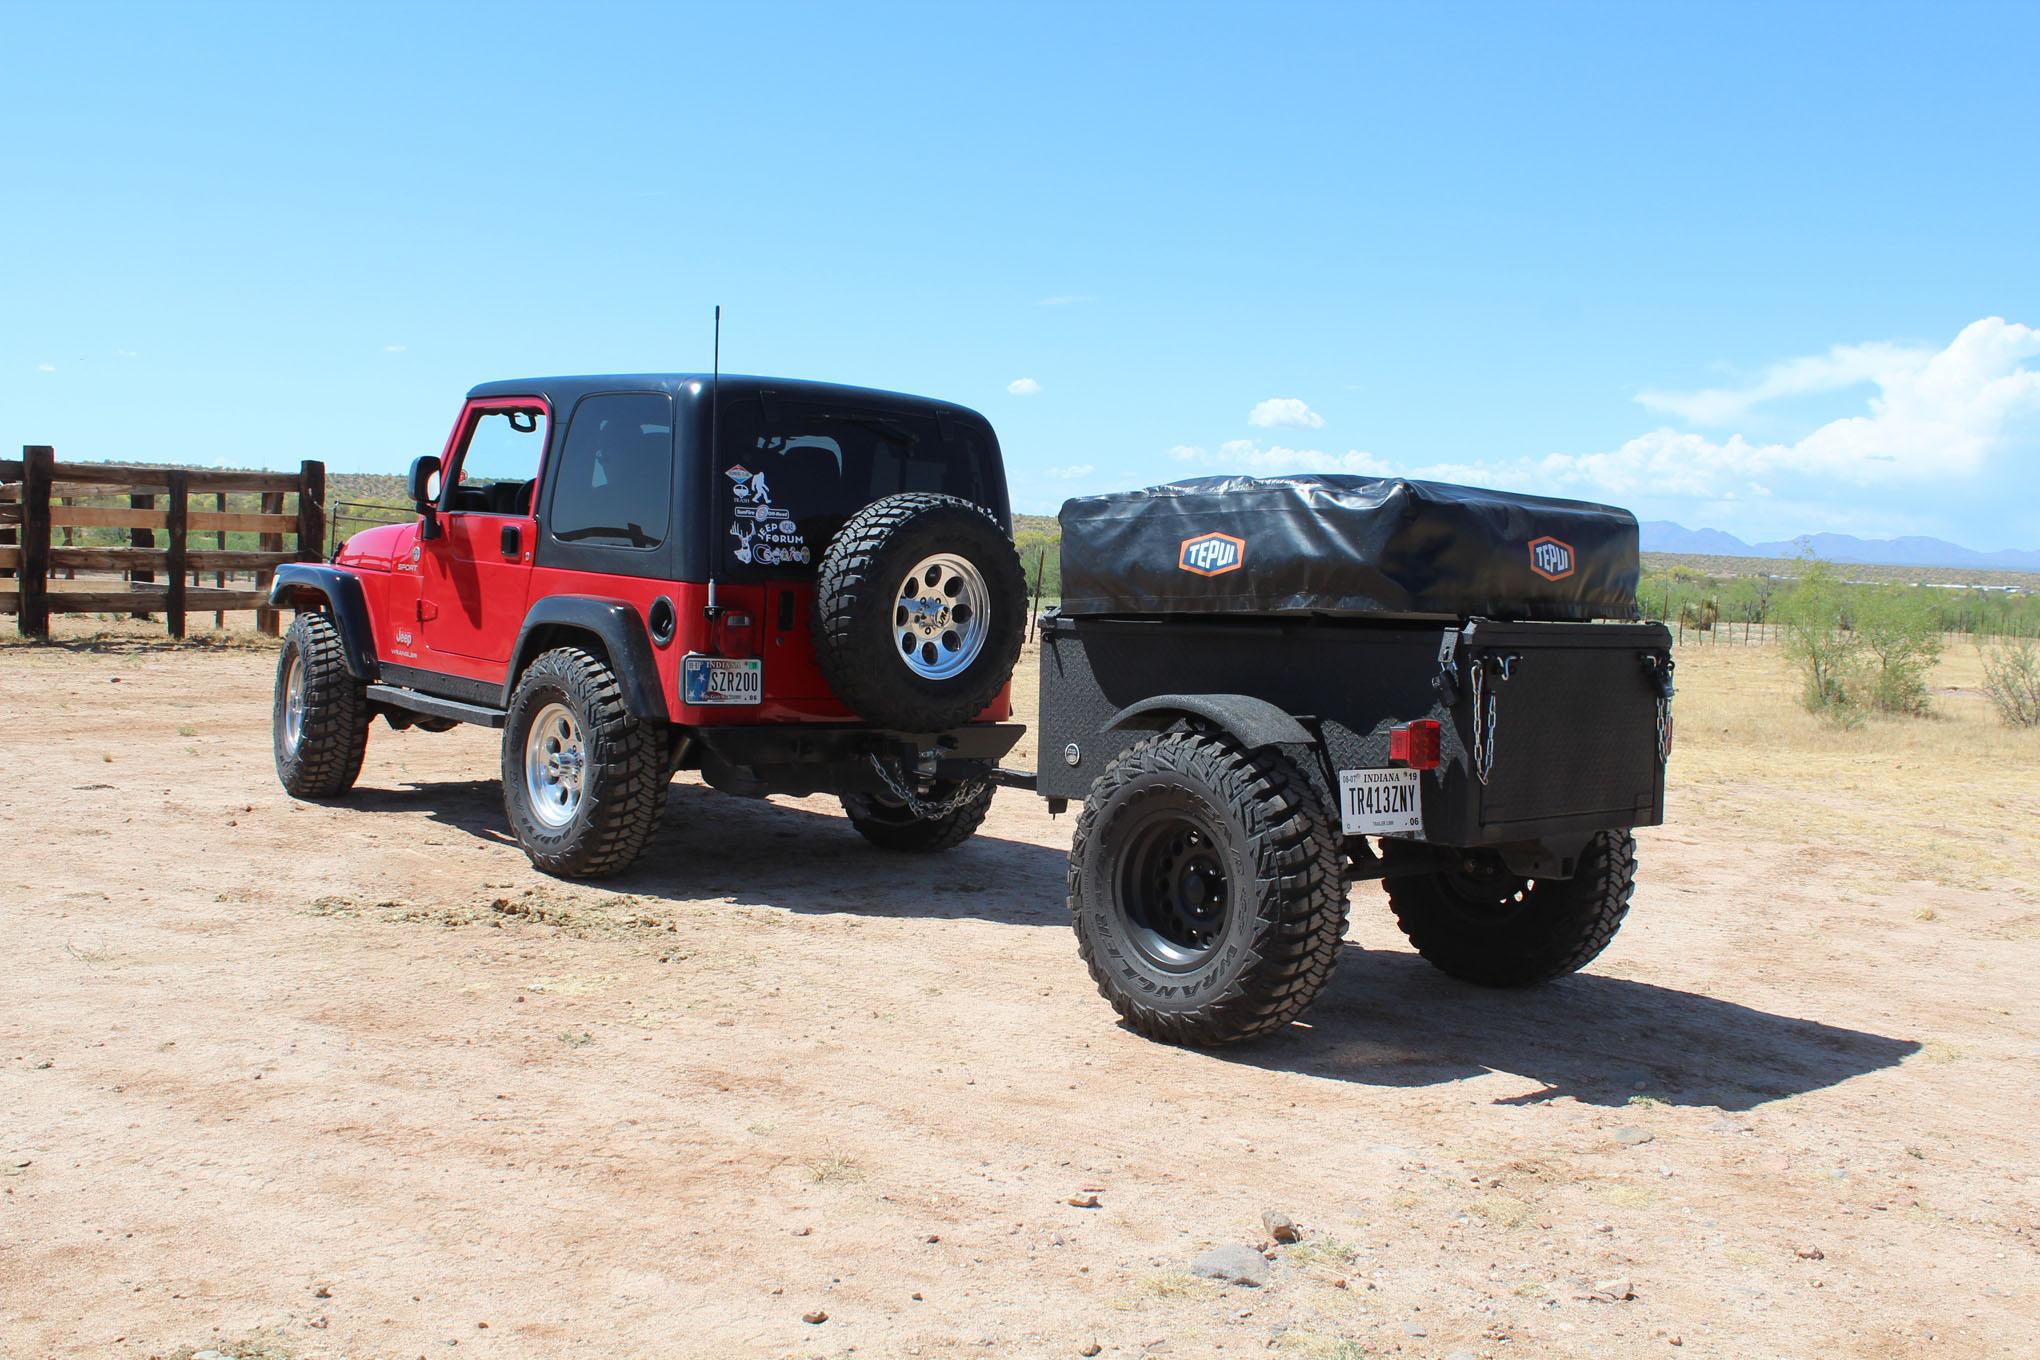 024 four wheeler aaron meyer 2006 jeep wrangler